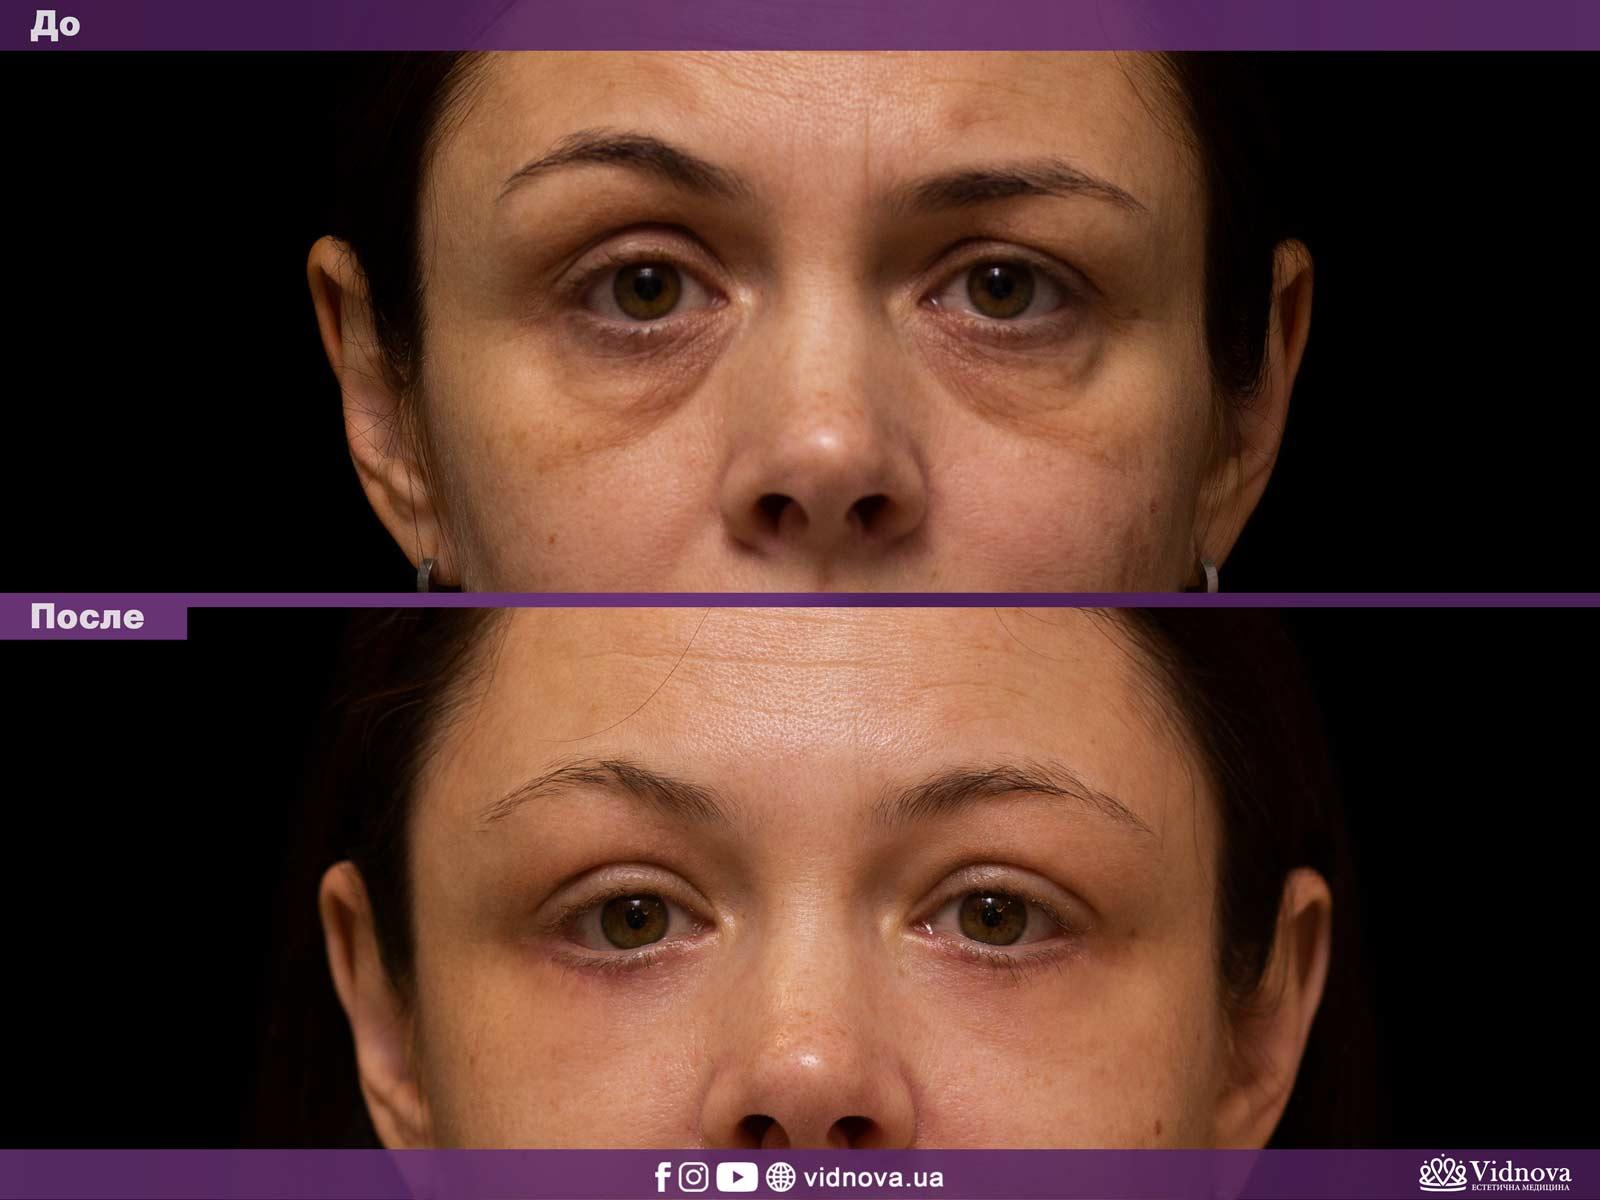 Блефаропластика: Фото До и После - Пример №2-1 - Клиника Vidnova